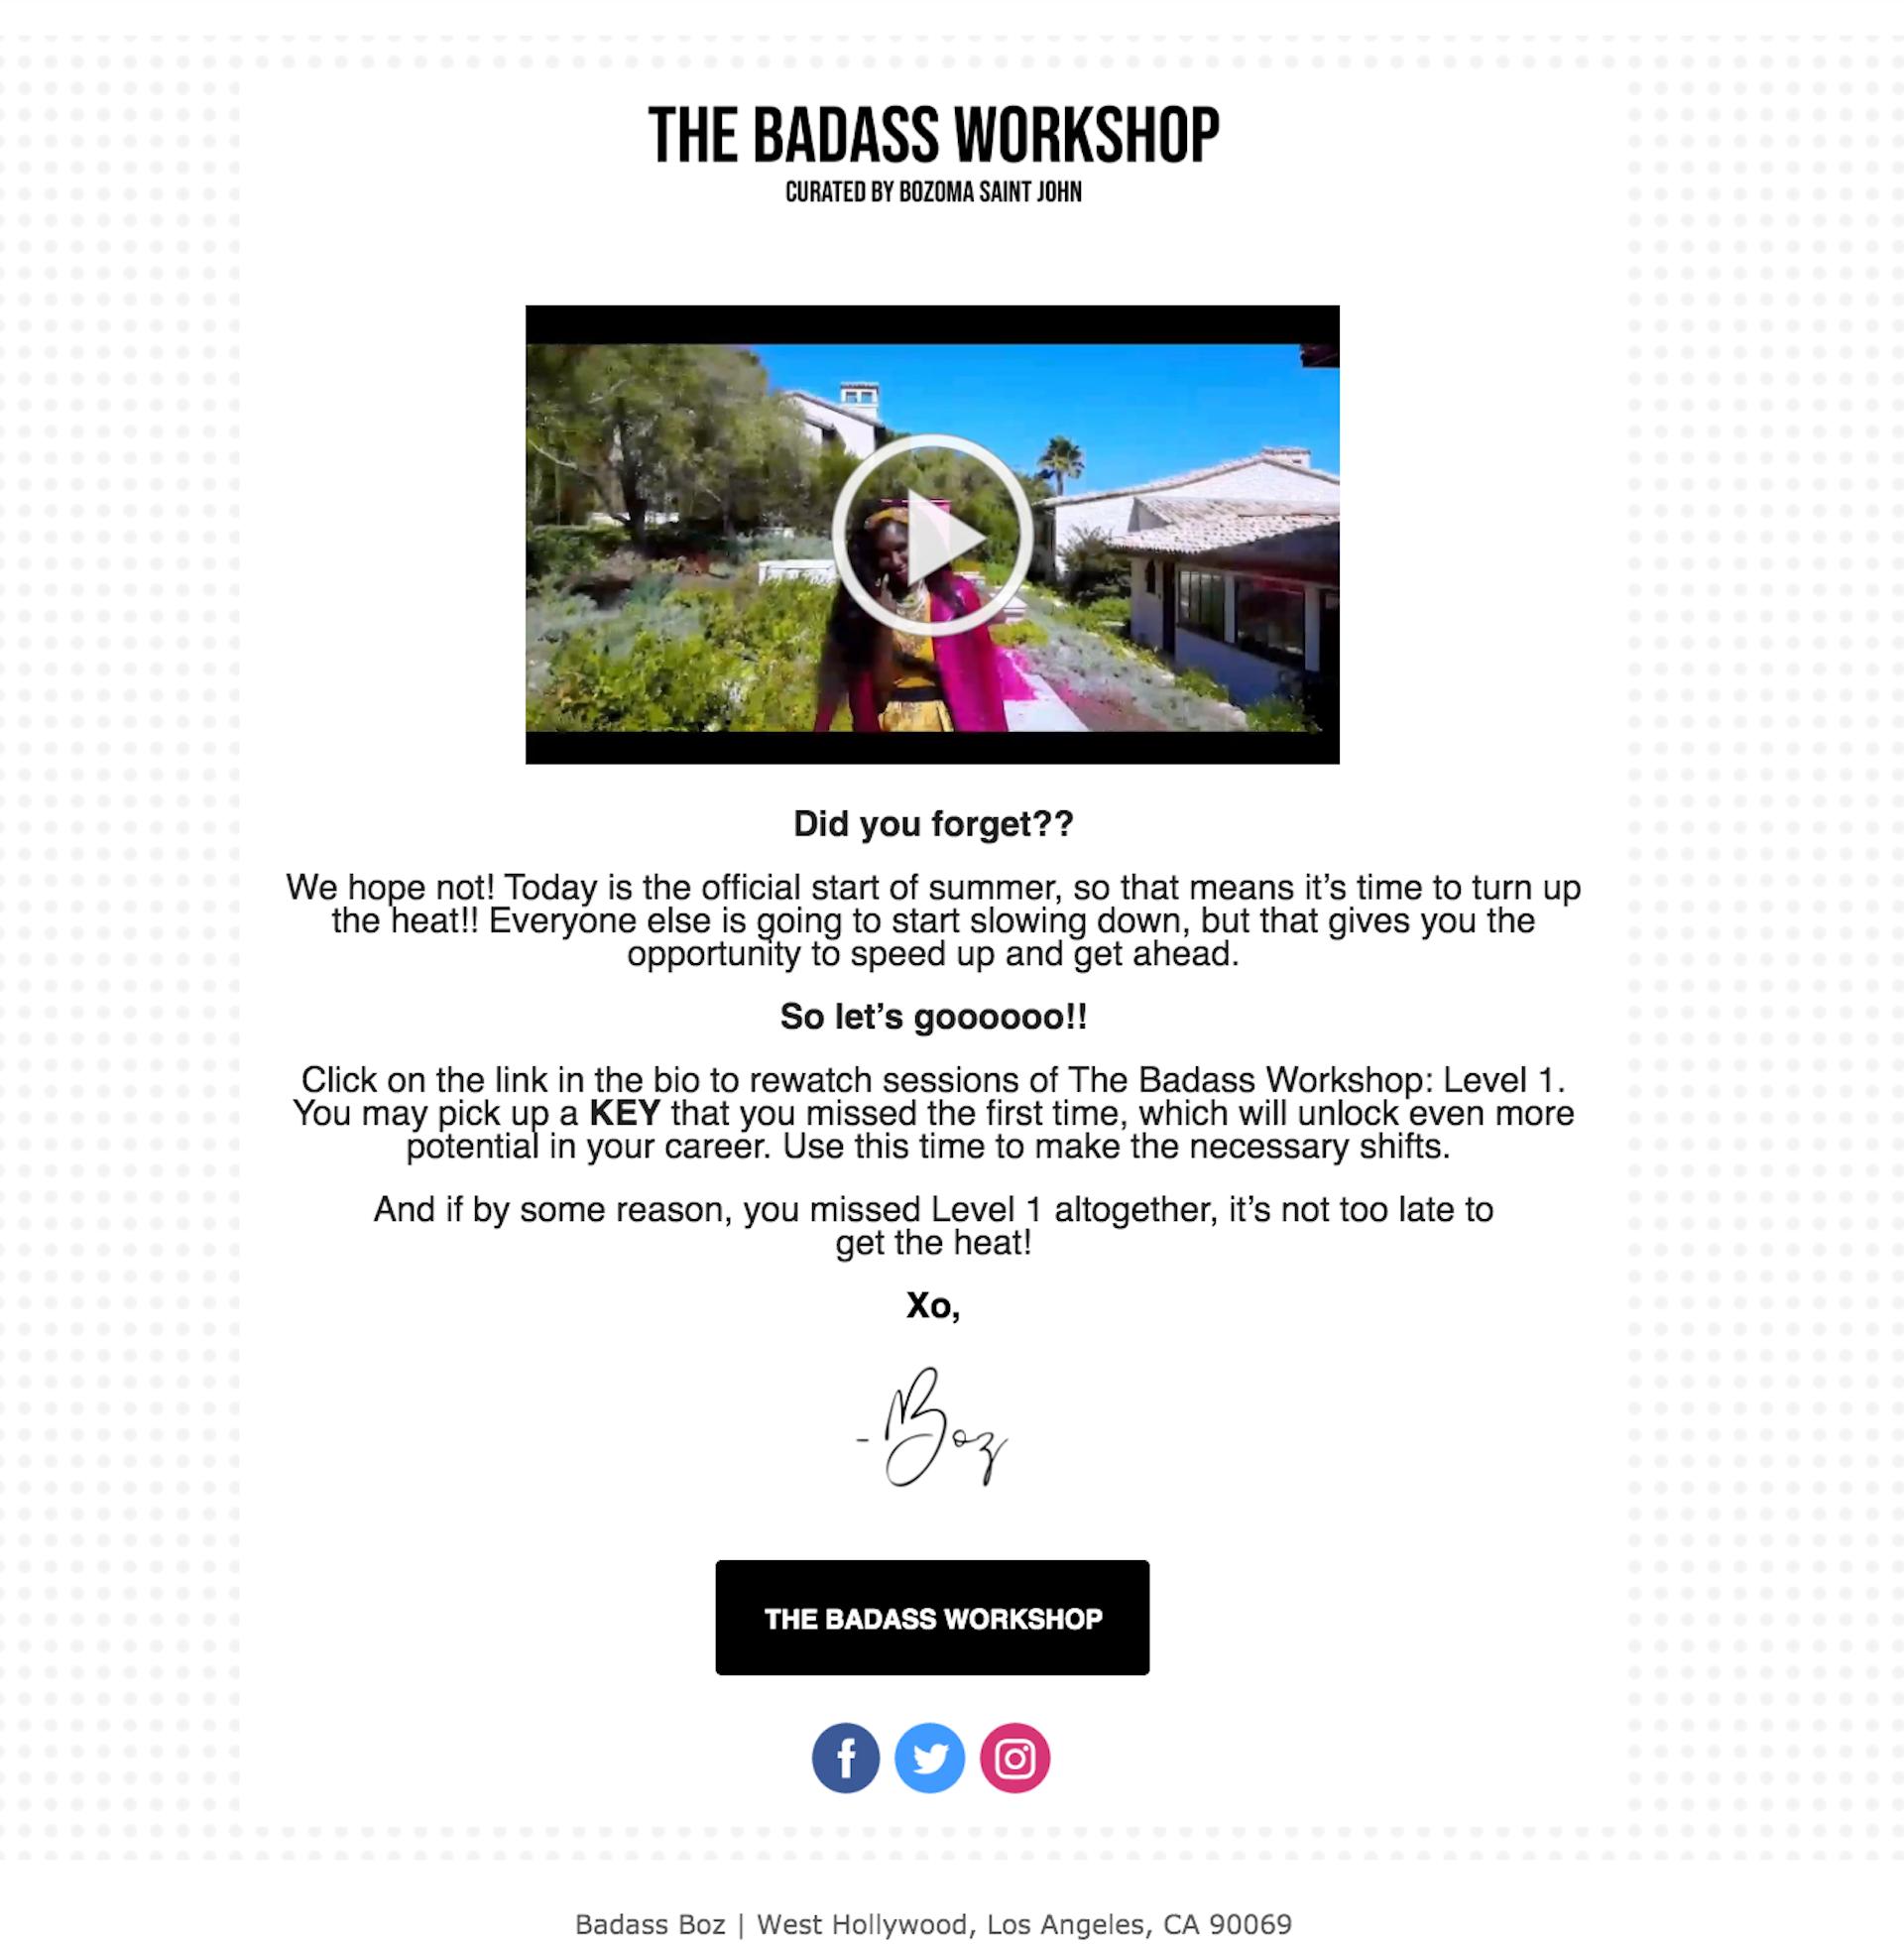 Webinar invitation email from The Badass Workshop.